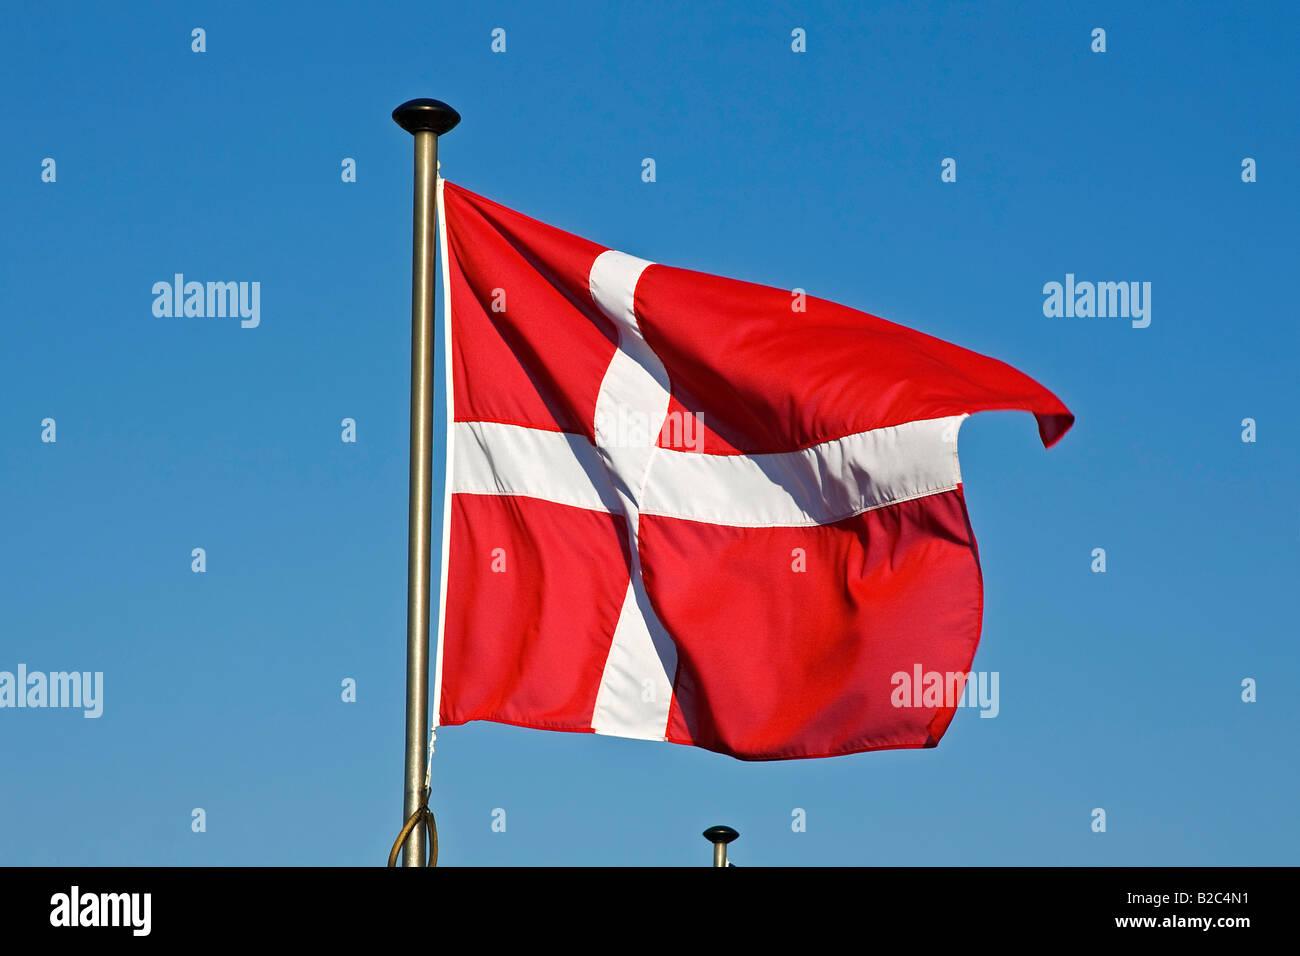 Danish Flag, Flag of Denmark, Dannebrog, fluttering in the wind on a flagpole - Stock Image